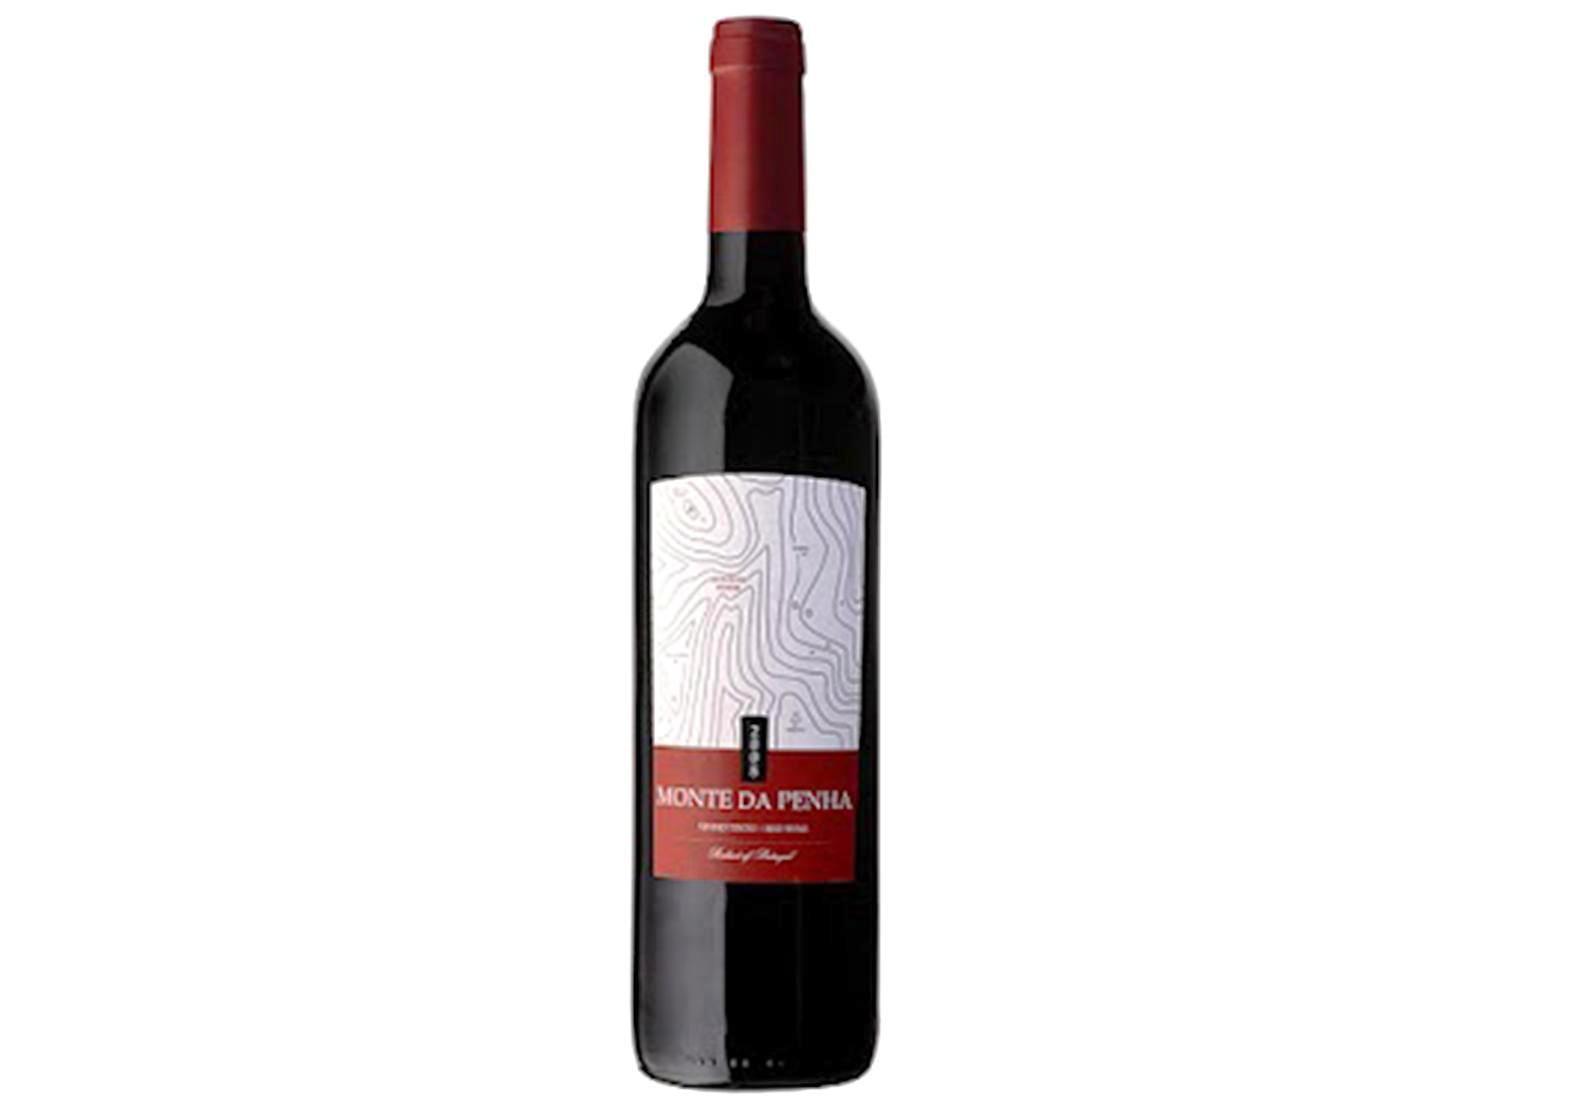 Monte da Penha Rouge - Vins de l'Alentejo Portugal